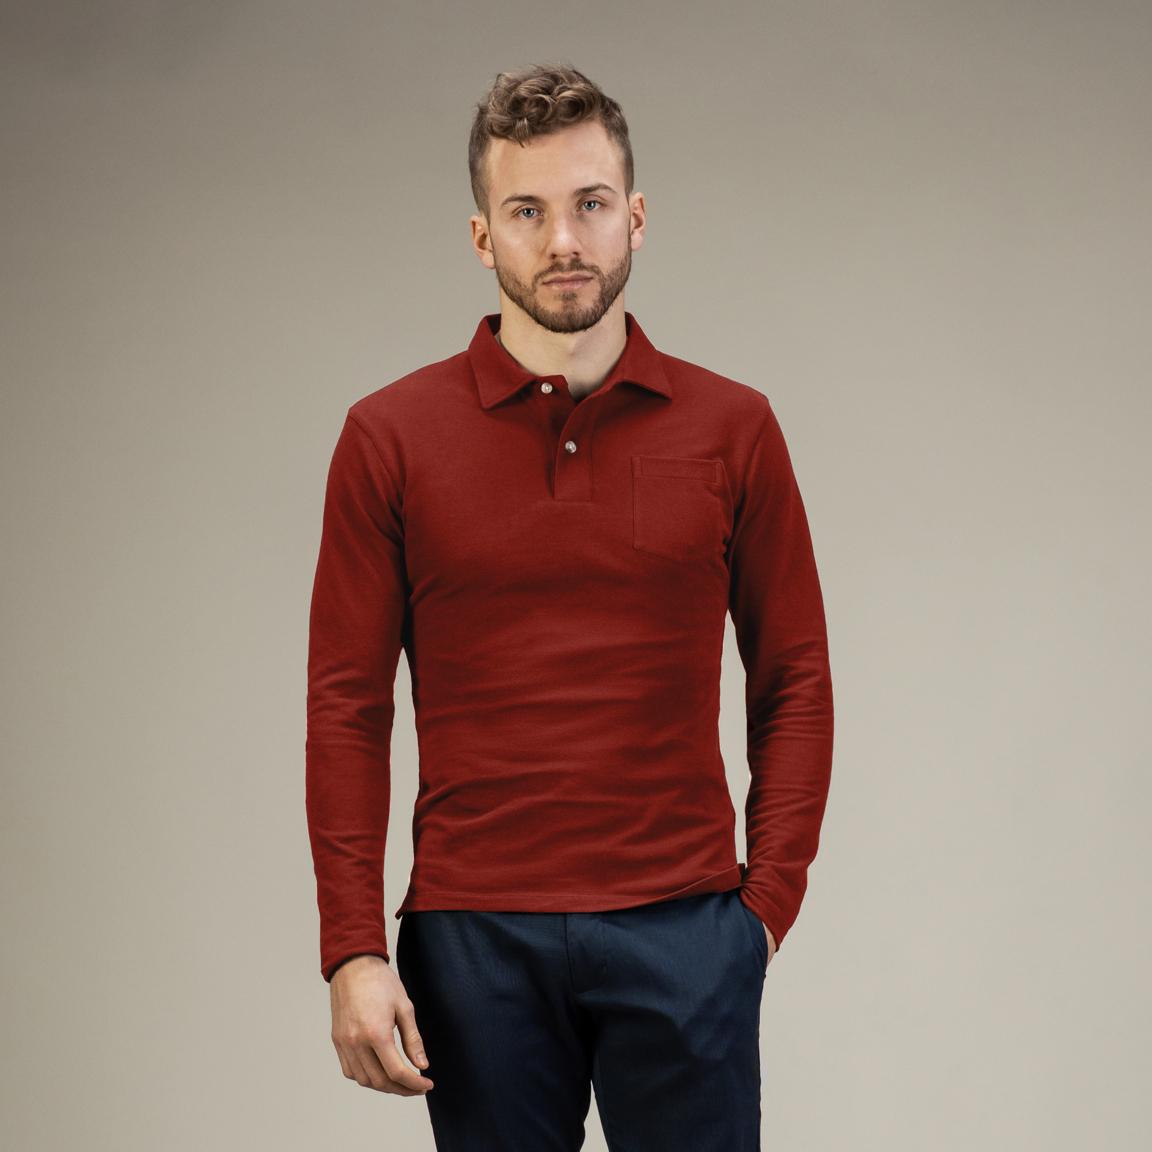 Dark red long-sleeved polo shirt